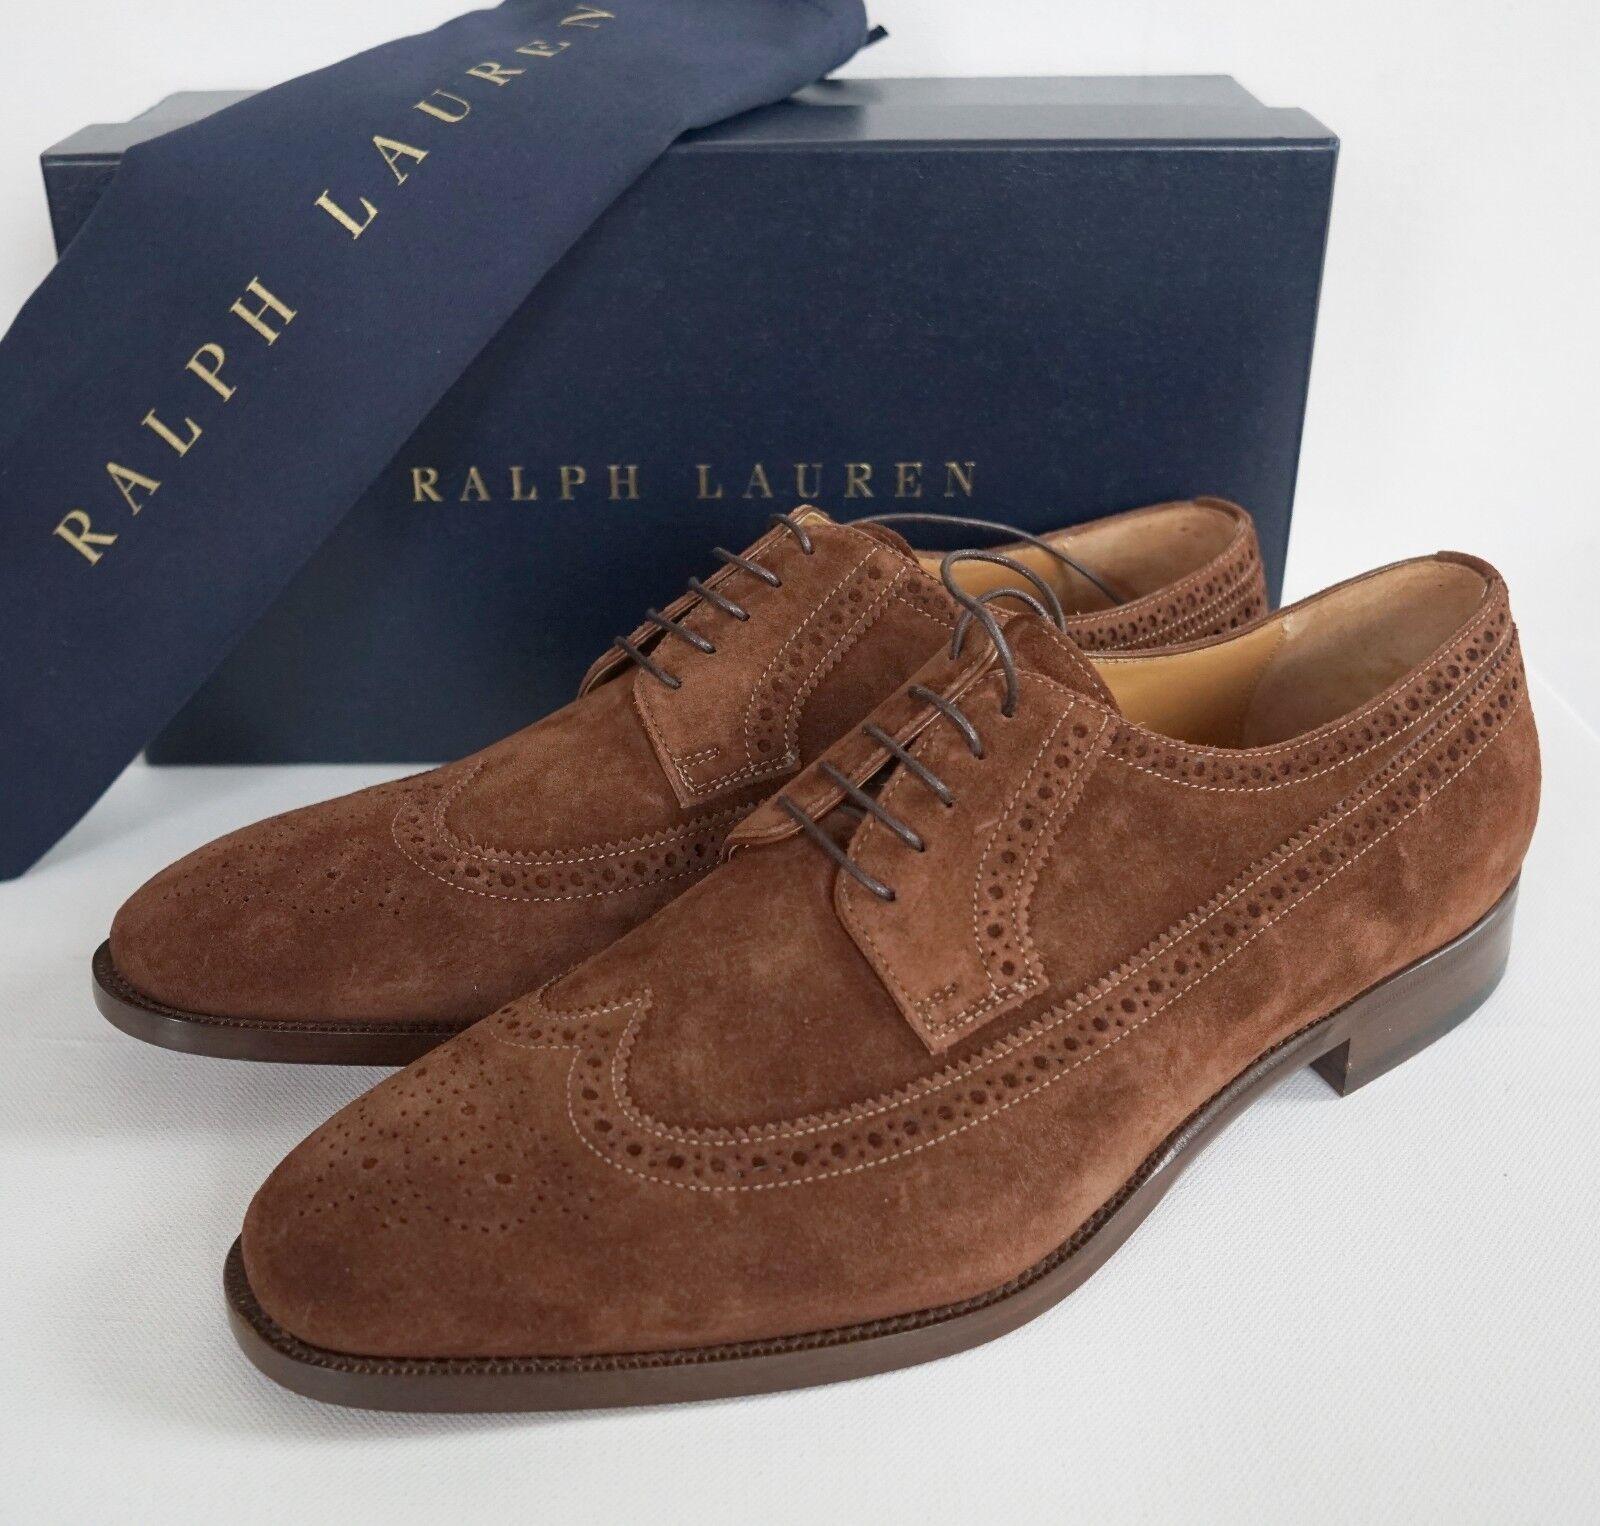 5 RALPH LAUREN BANSTEAD Brown Suede WINGTIP Dress Shoes US-10D EUR-43 Scarpe classiche da uomo